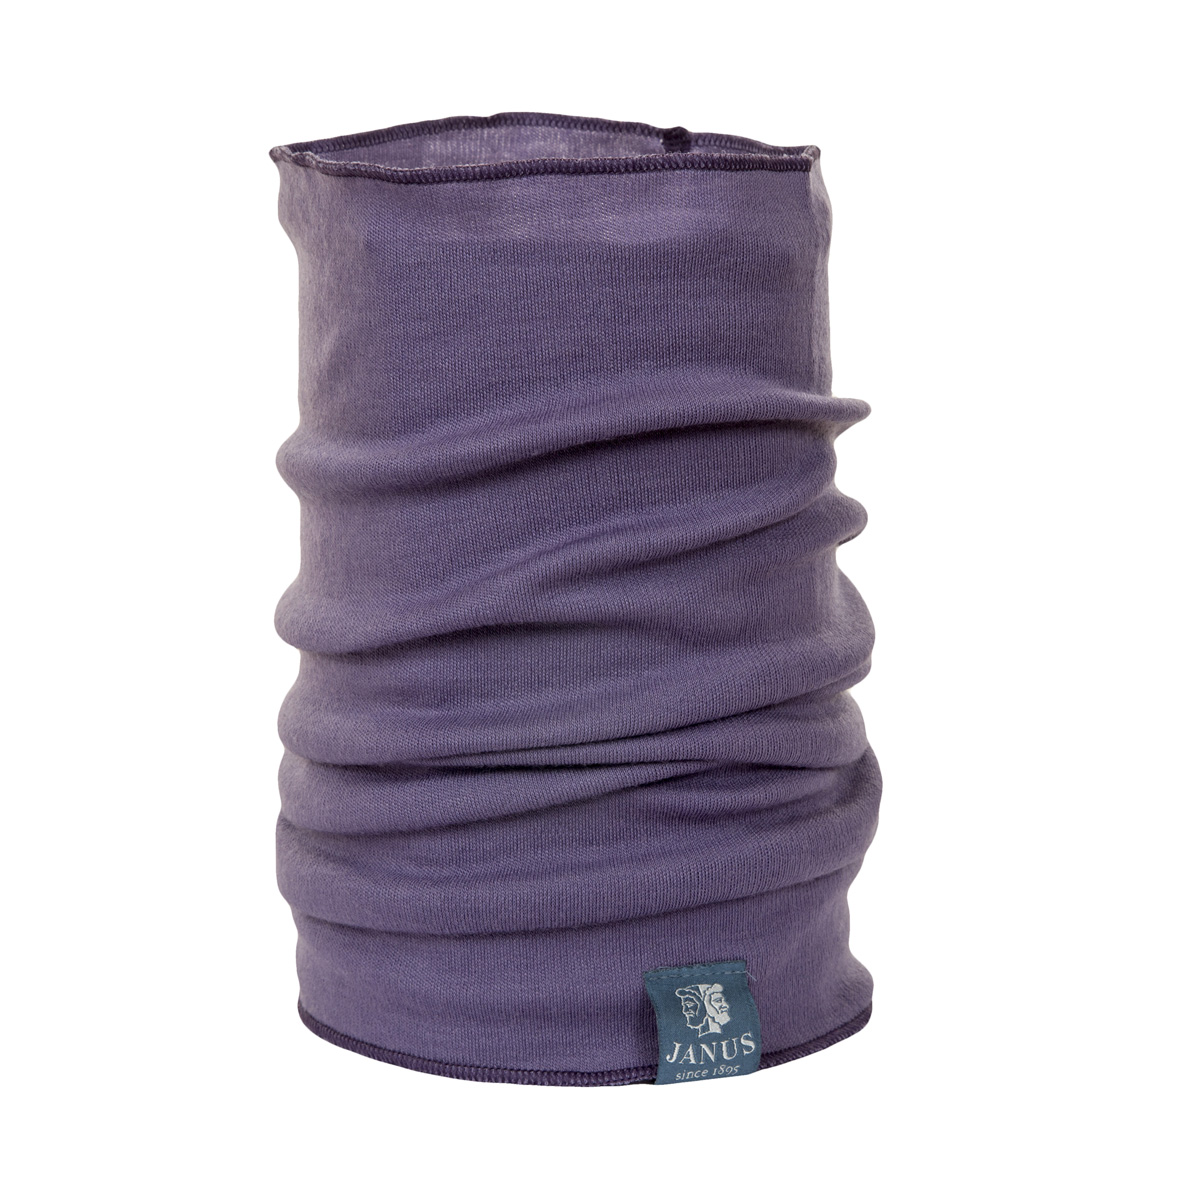 Tubhalsduk, neckwarmer Janus 100% merinoull lila